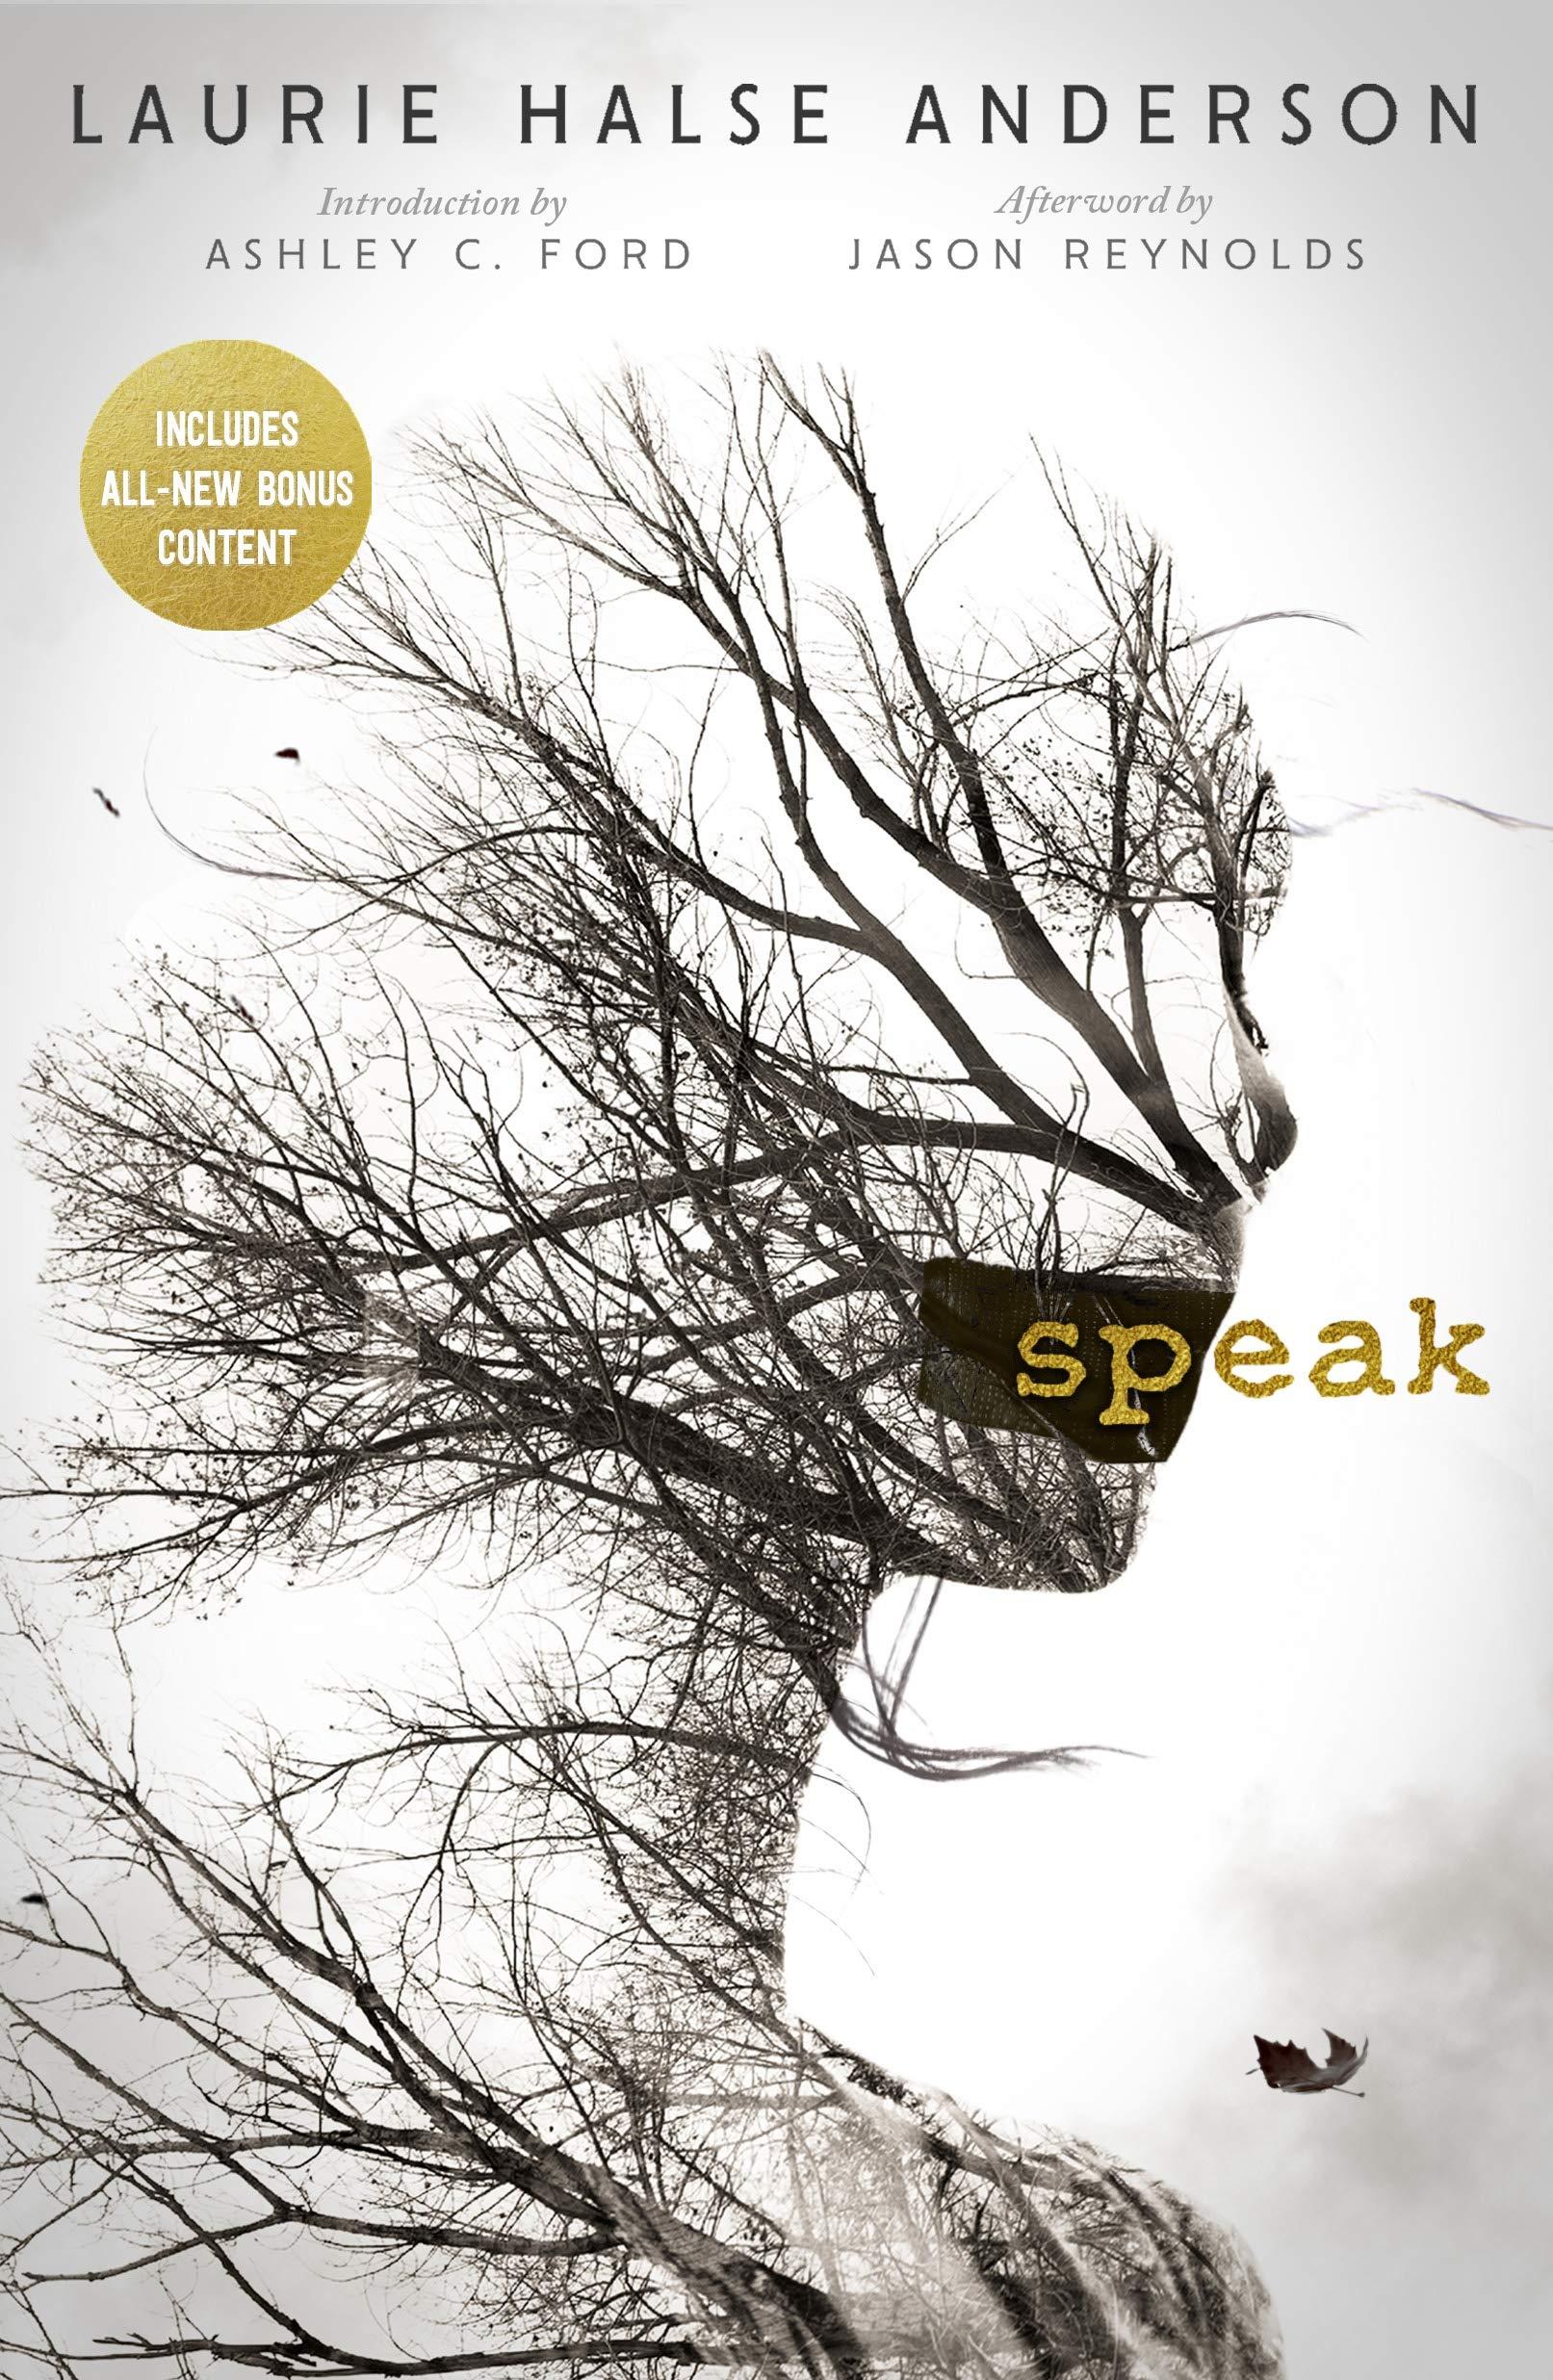 Amazon.com: Speak 20th Anniversary Edition: 9780374311254: Anderson, Laurie  Halse: Books